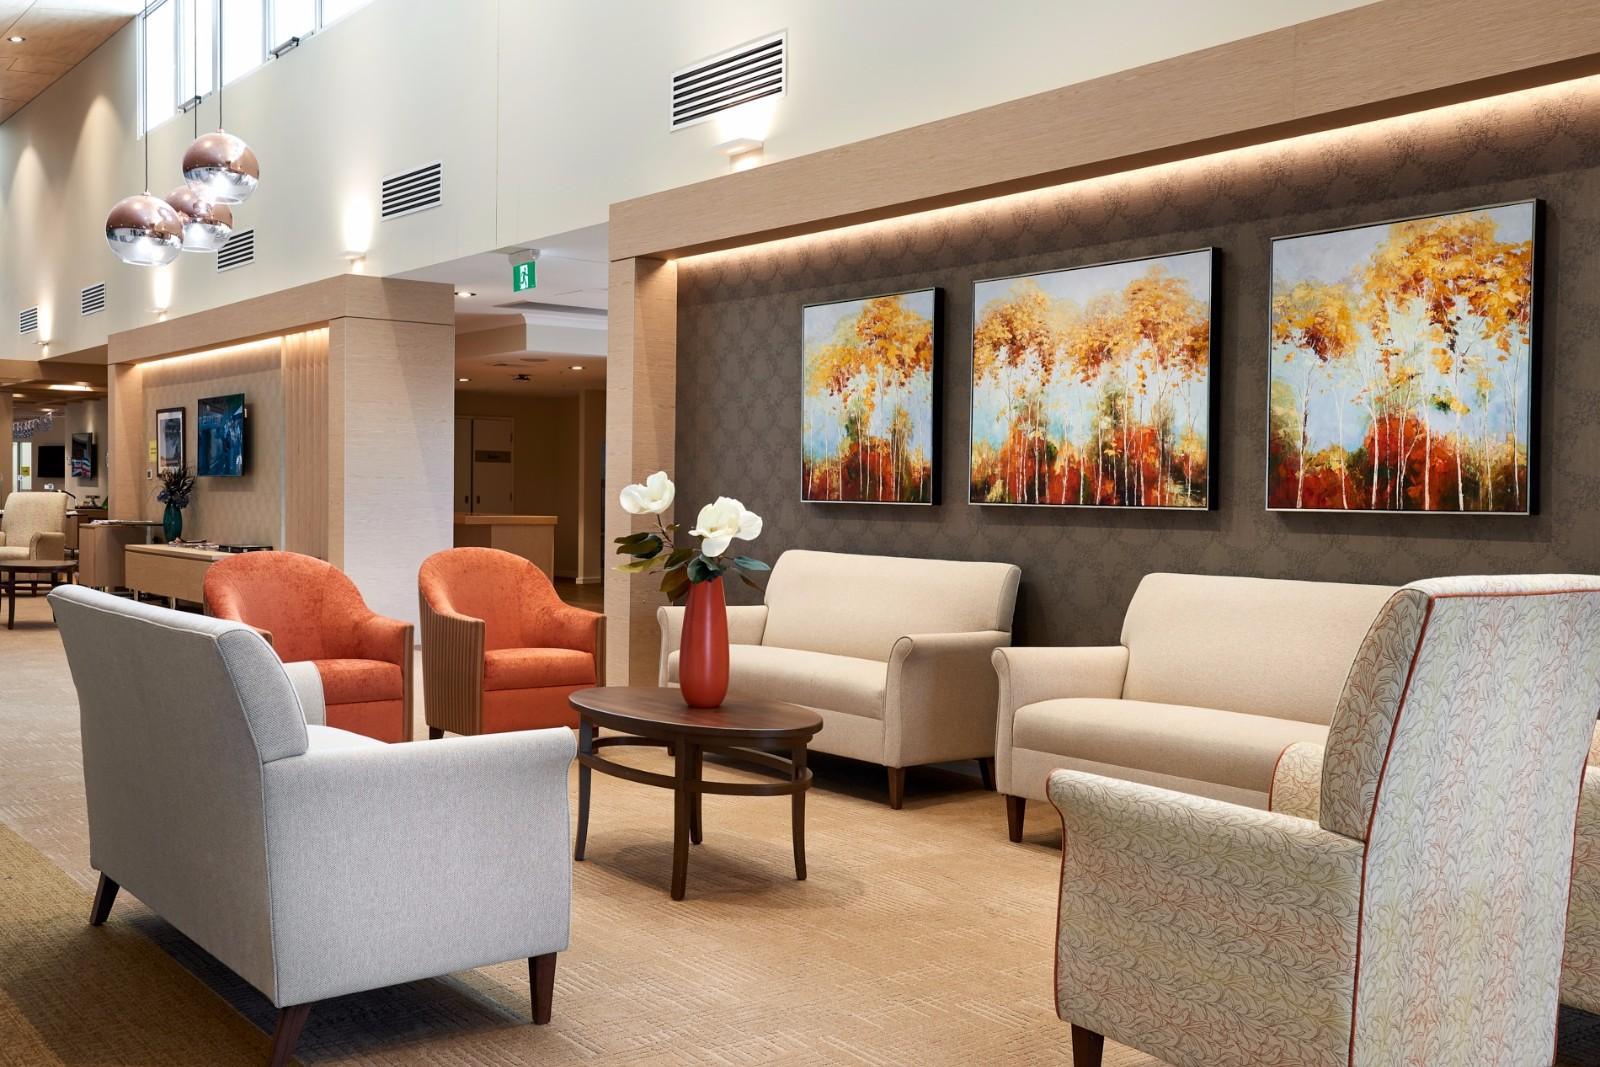 YSK Furniture healthcare senior living furniture retirement senior age-1